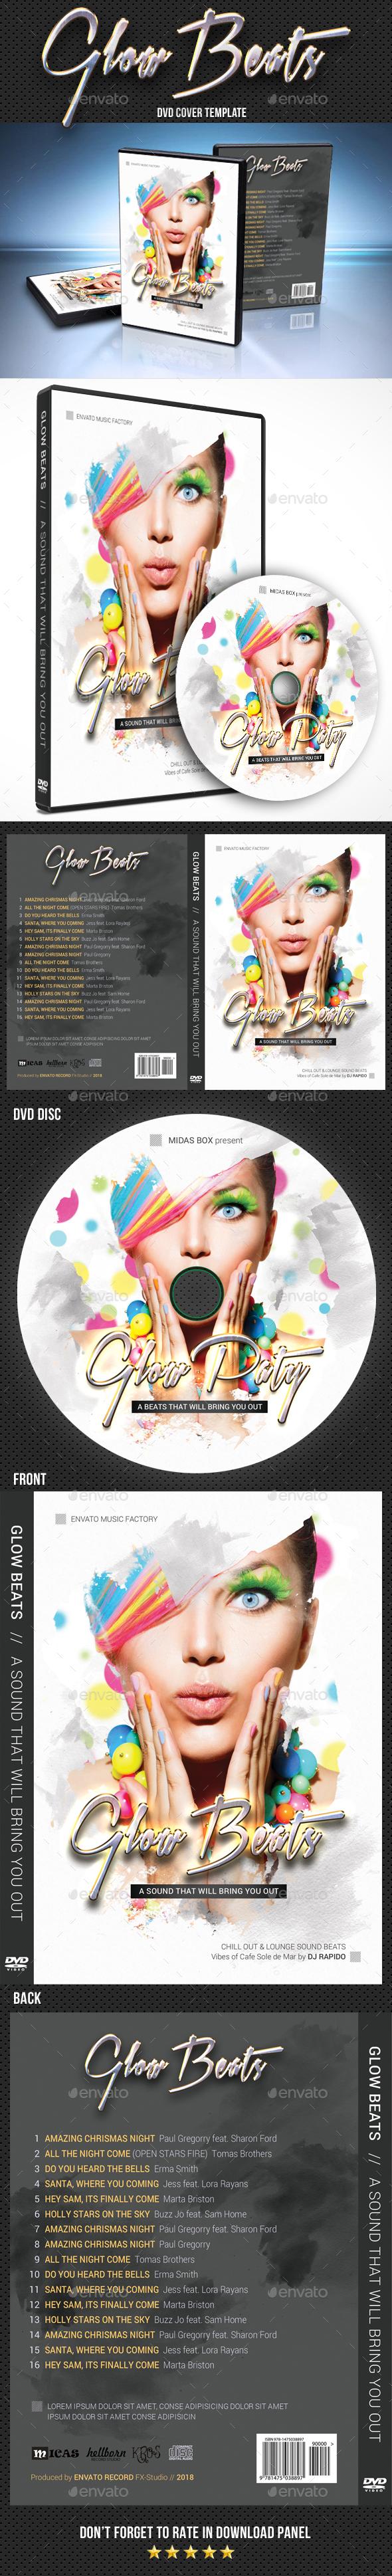 Glow Beats DVD Cover Template - CD & DVD Artwork Print Templates